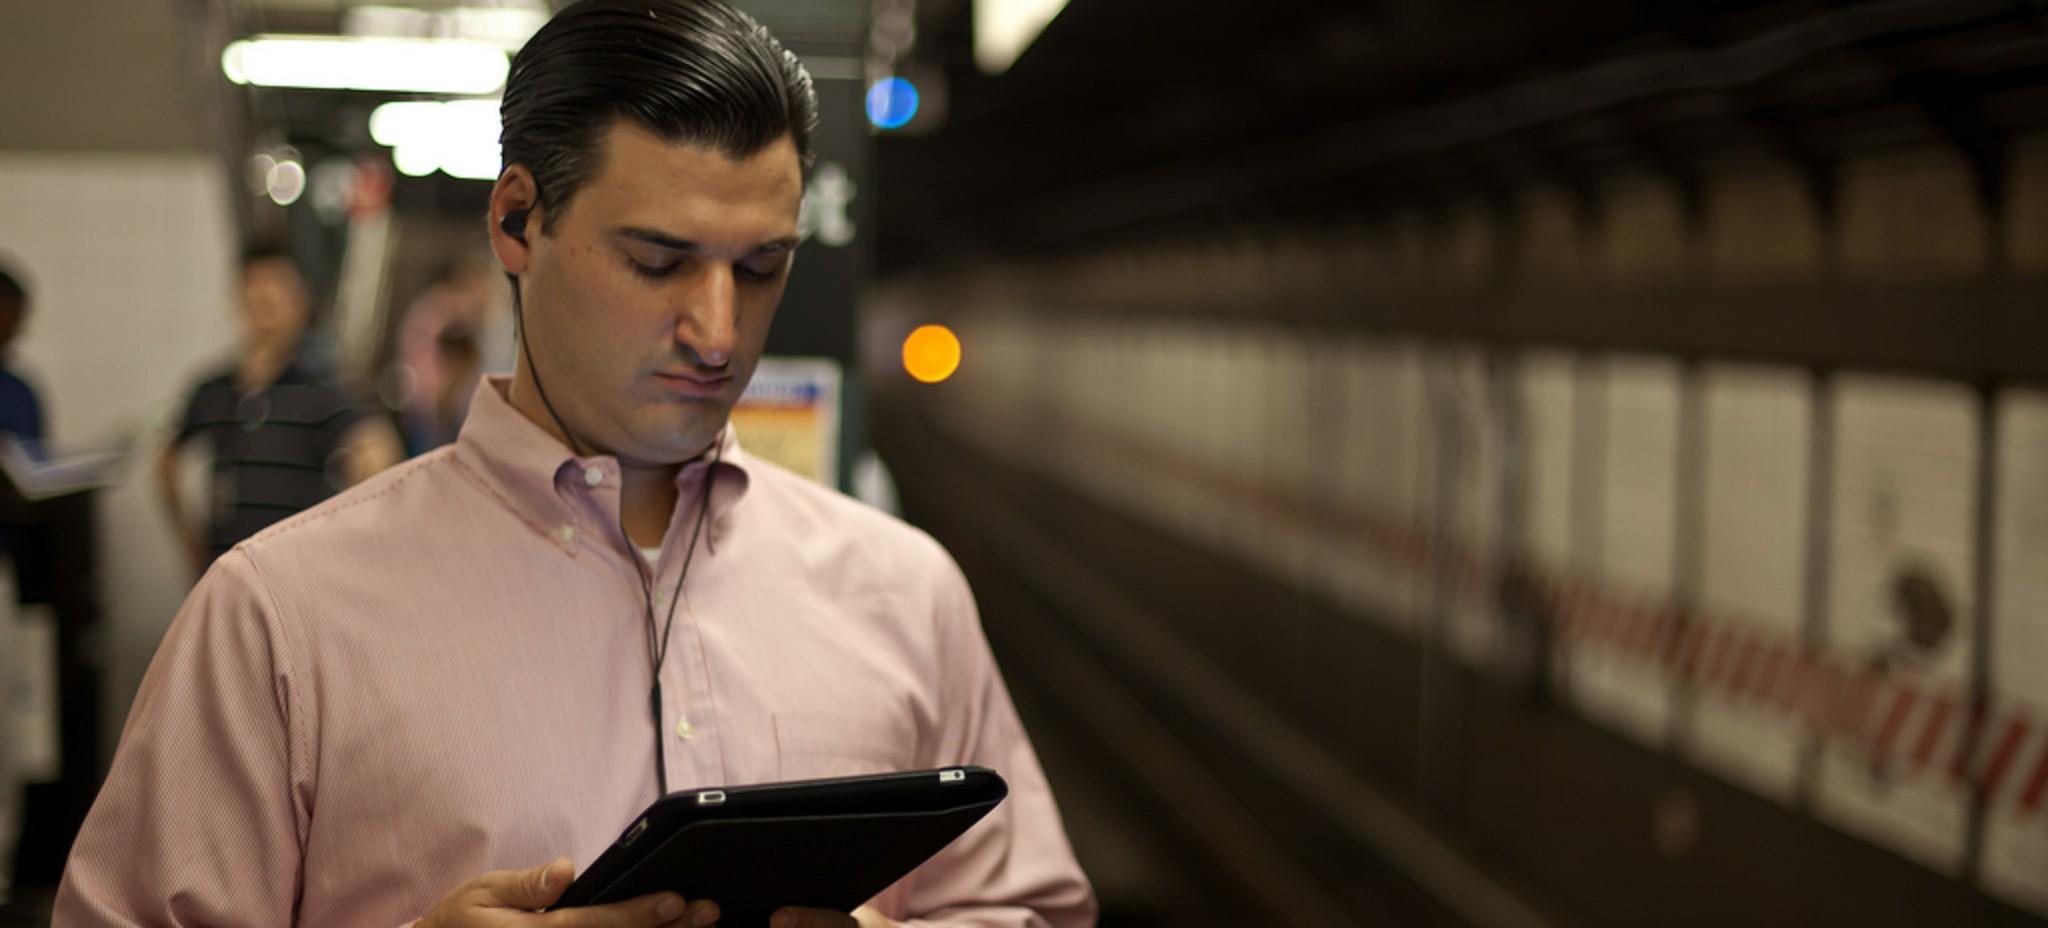 APP時代的閱讀方式,新科技將引領讀者何去何從?